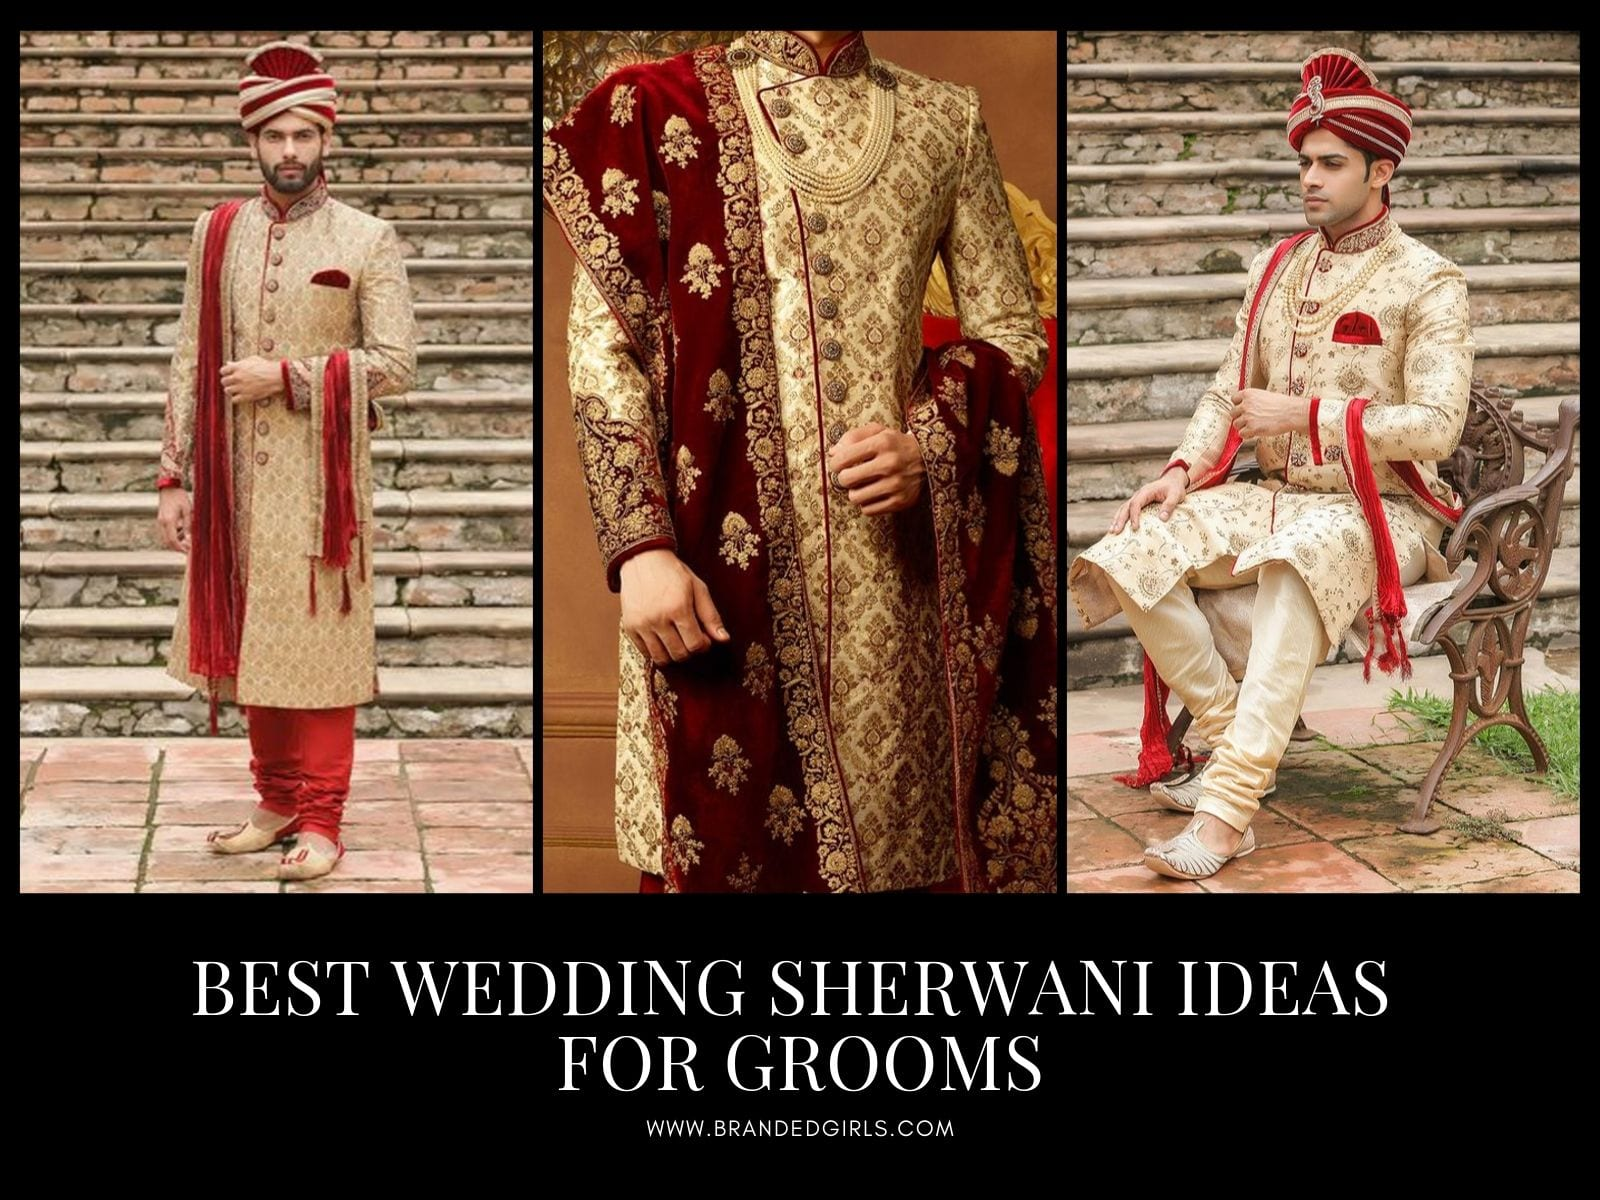 Best-Sherwani-Ideas-for-Grooms Wedding Sherwani Outfits - 20 Best Sherwani Ideas for Grooms